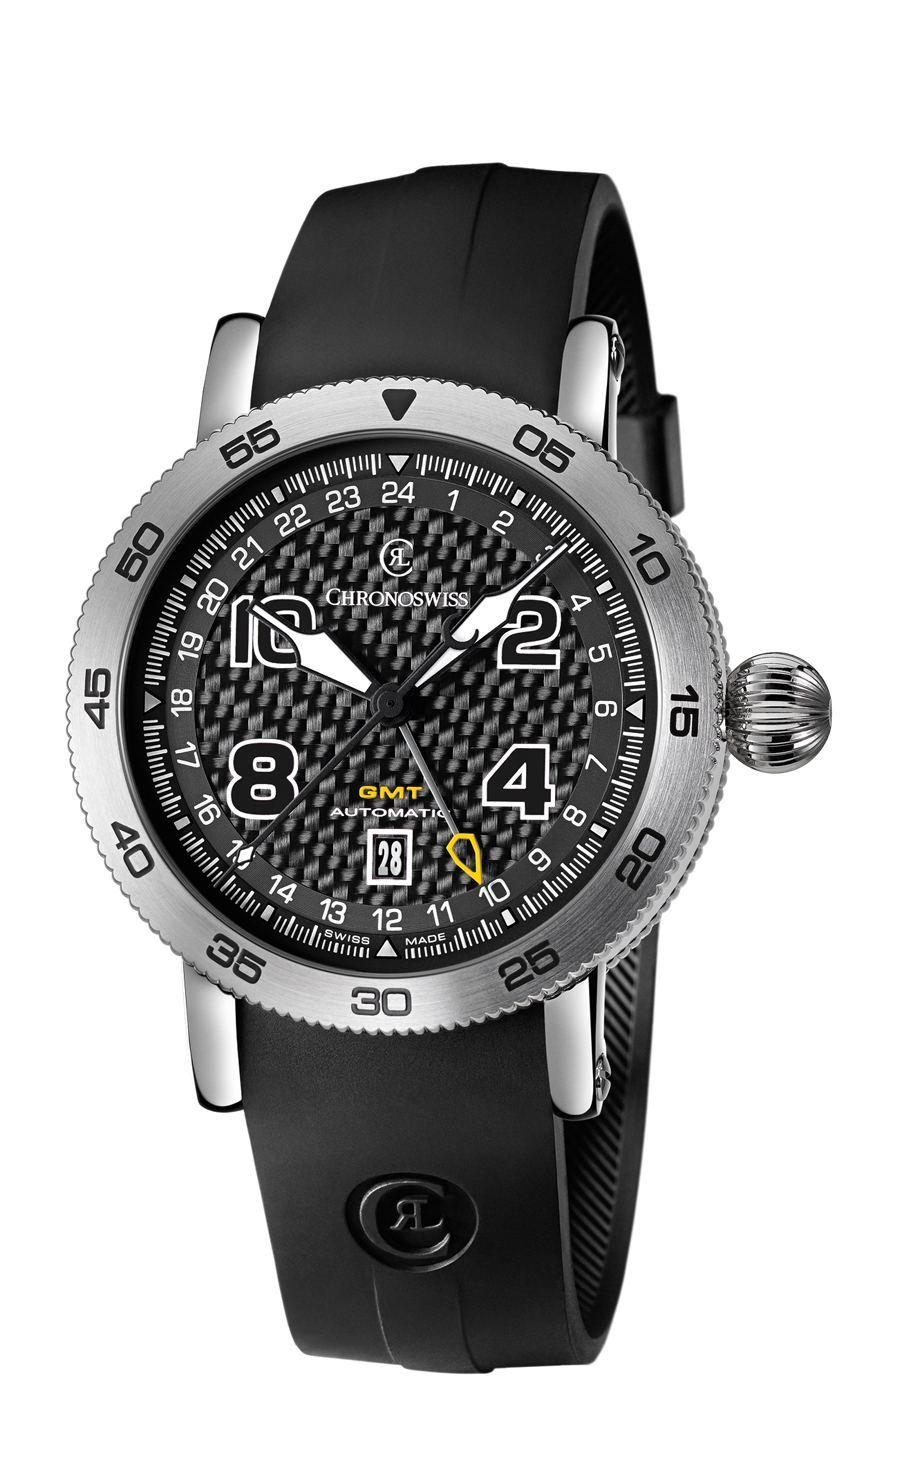 Chronoswiss: Timemaster GMT, Carbon-Zifferblatt und Kautschukband